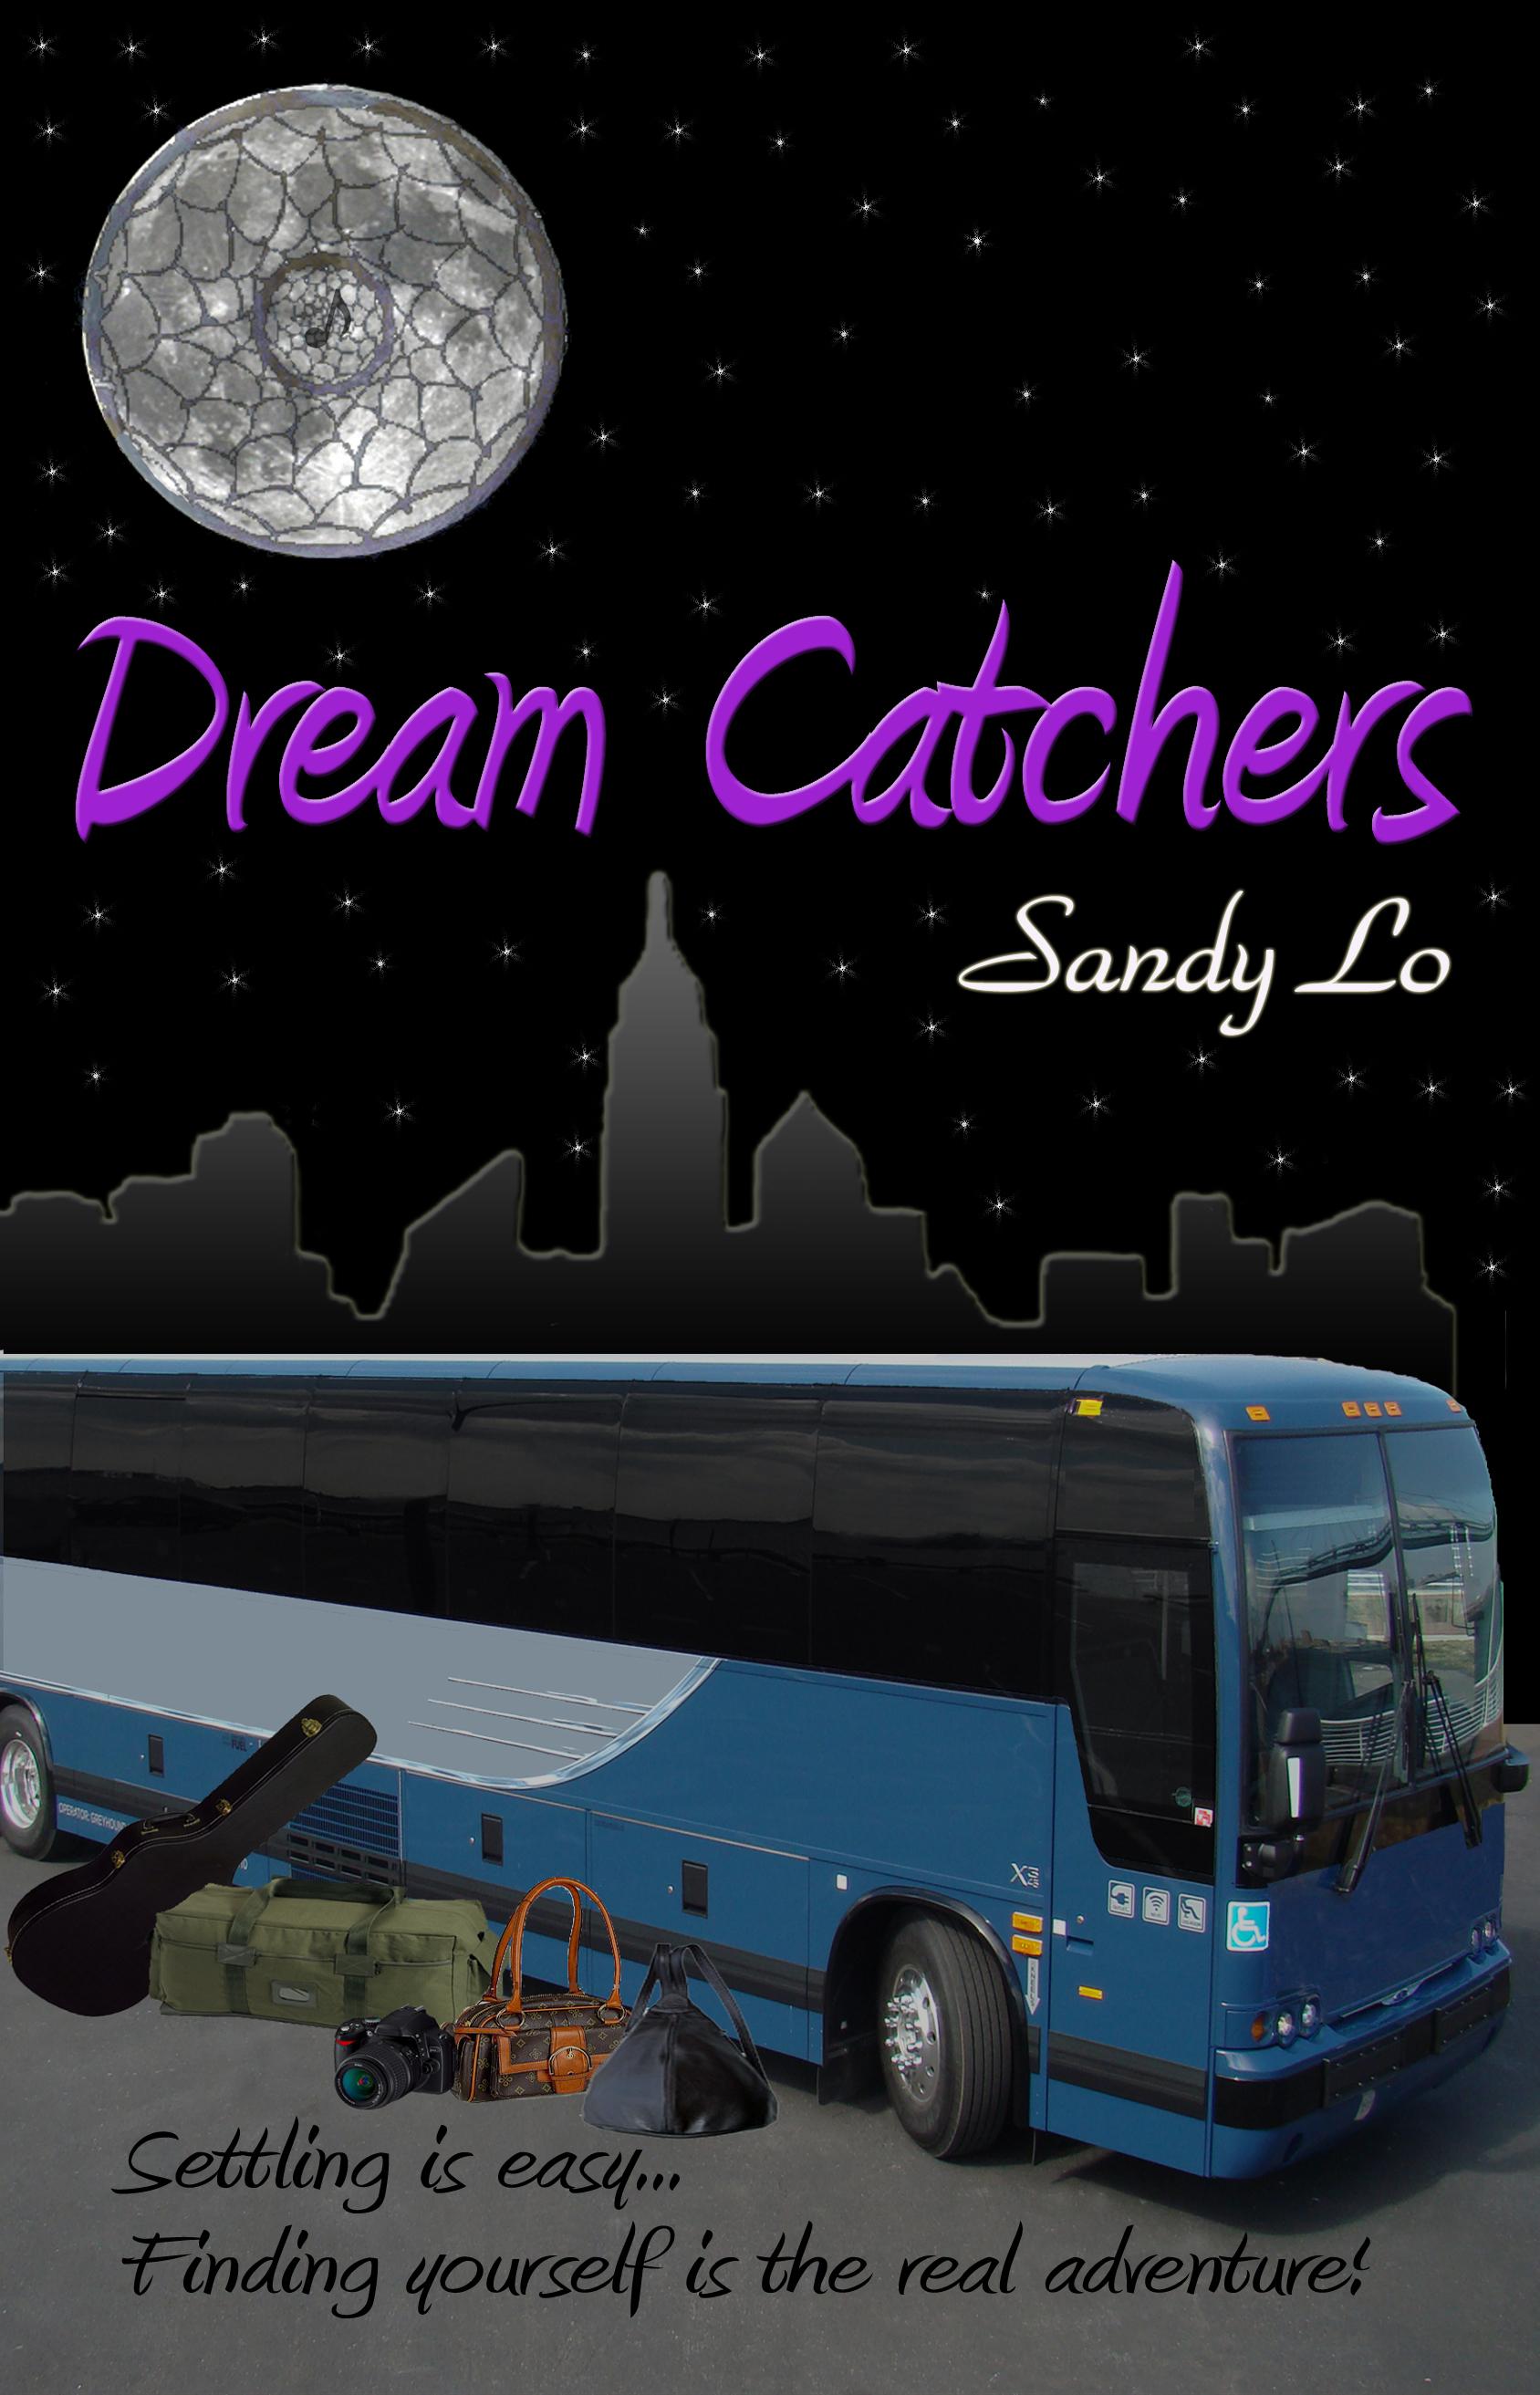 Dream Catchers by Sandy Lo